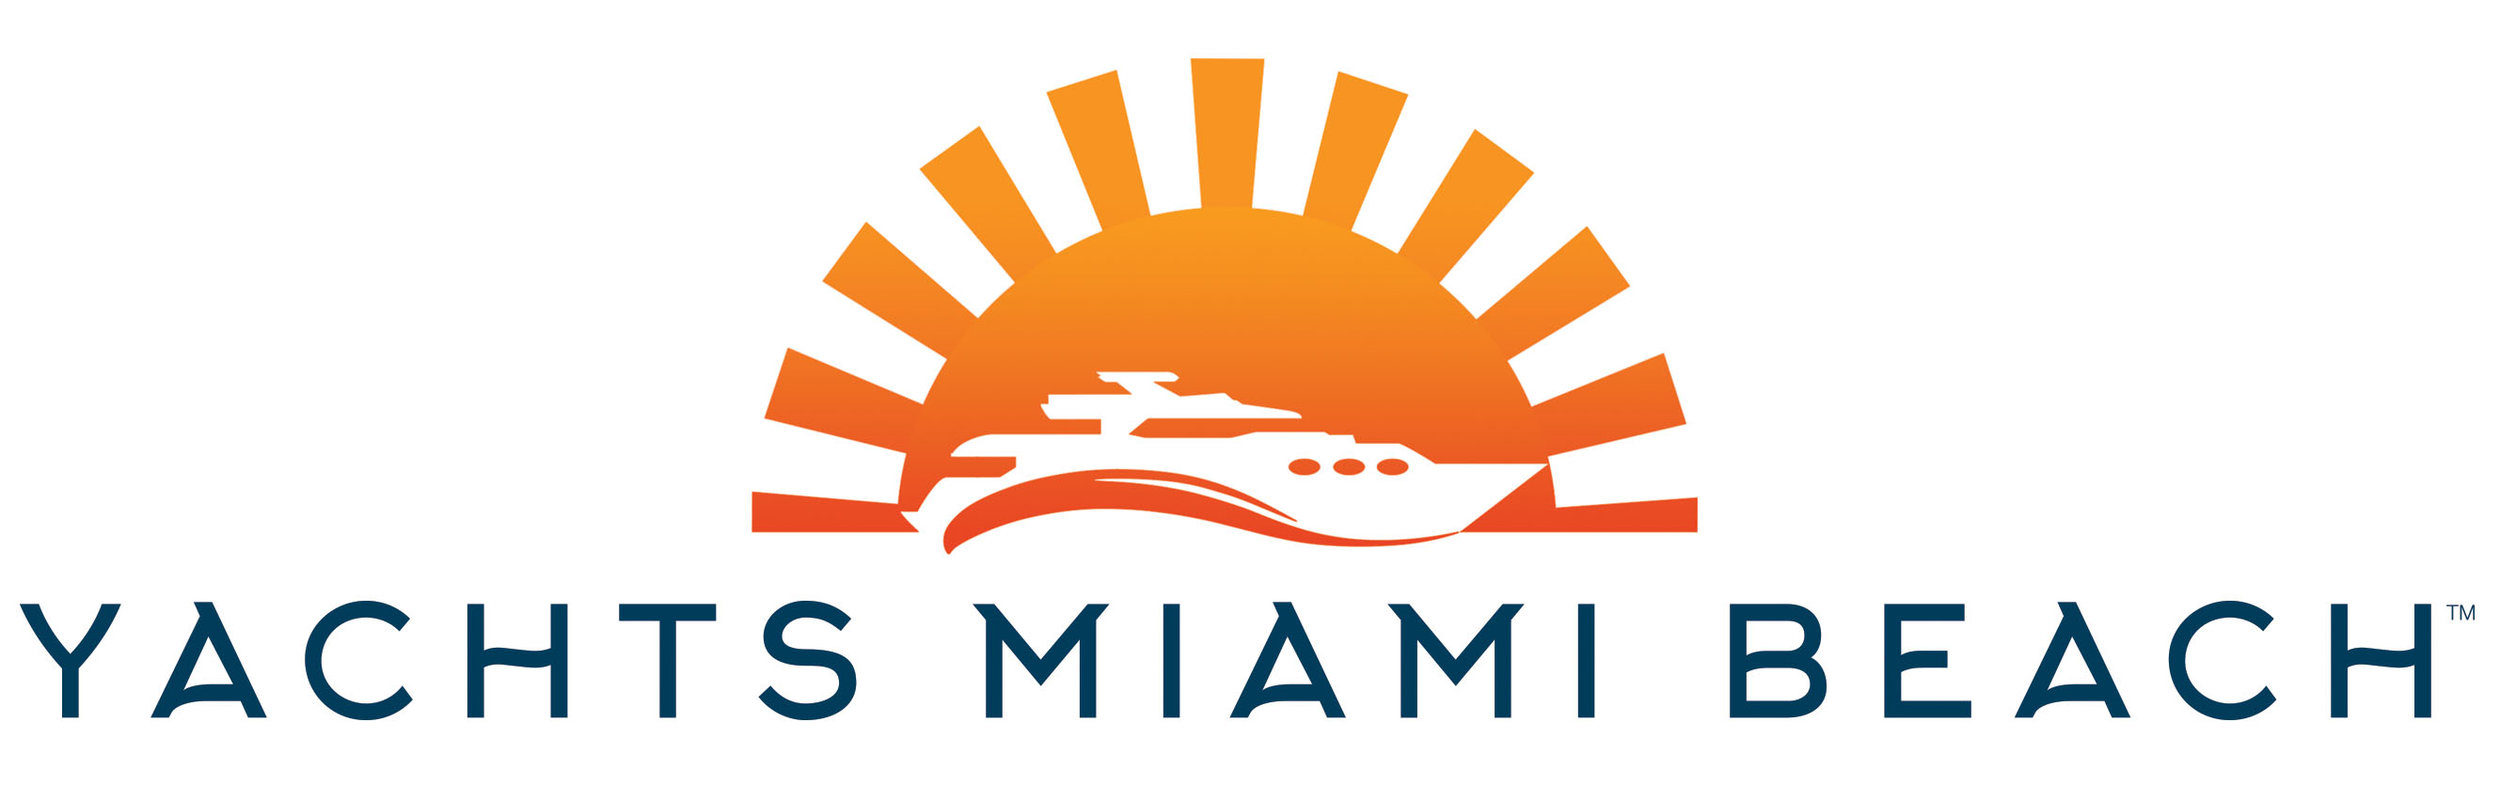 Copy of Yachts Miami Beach, Boat Show Miami